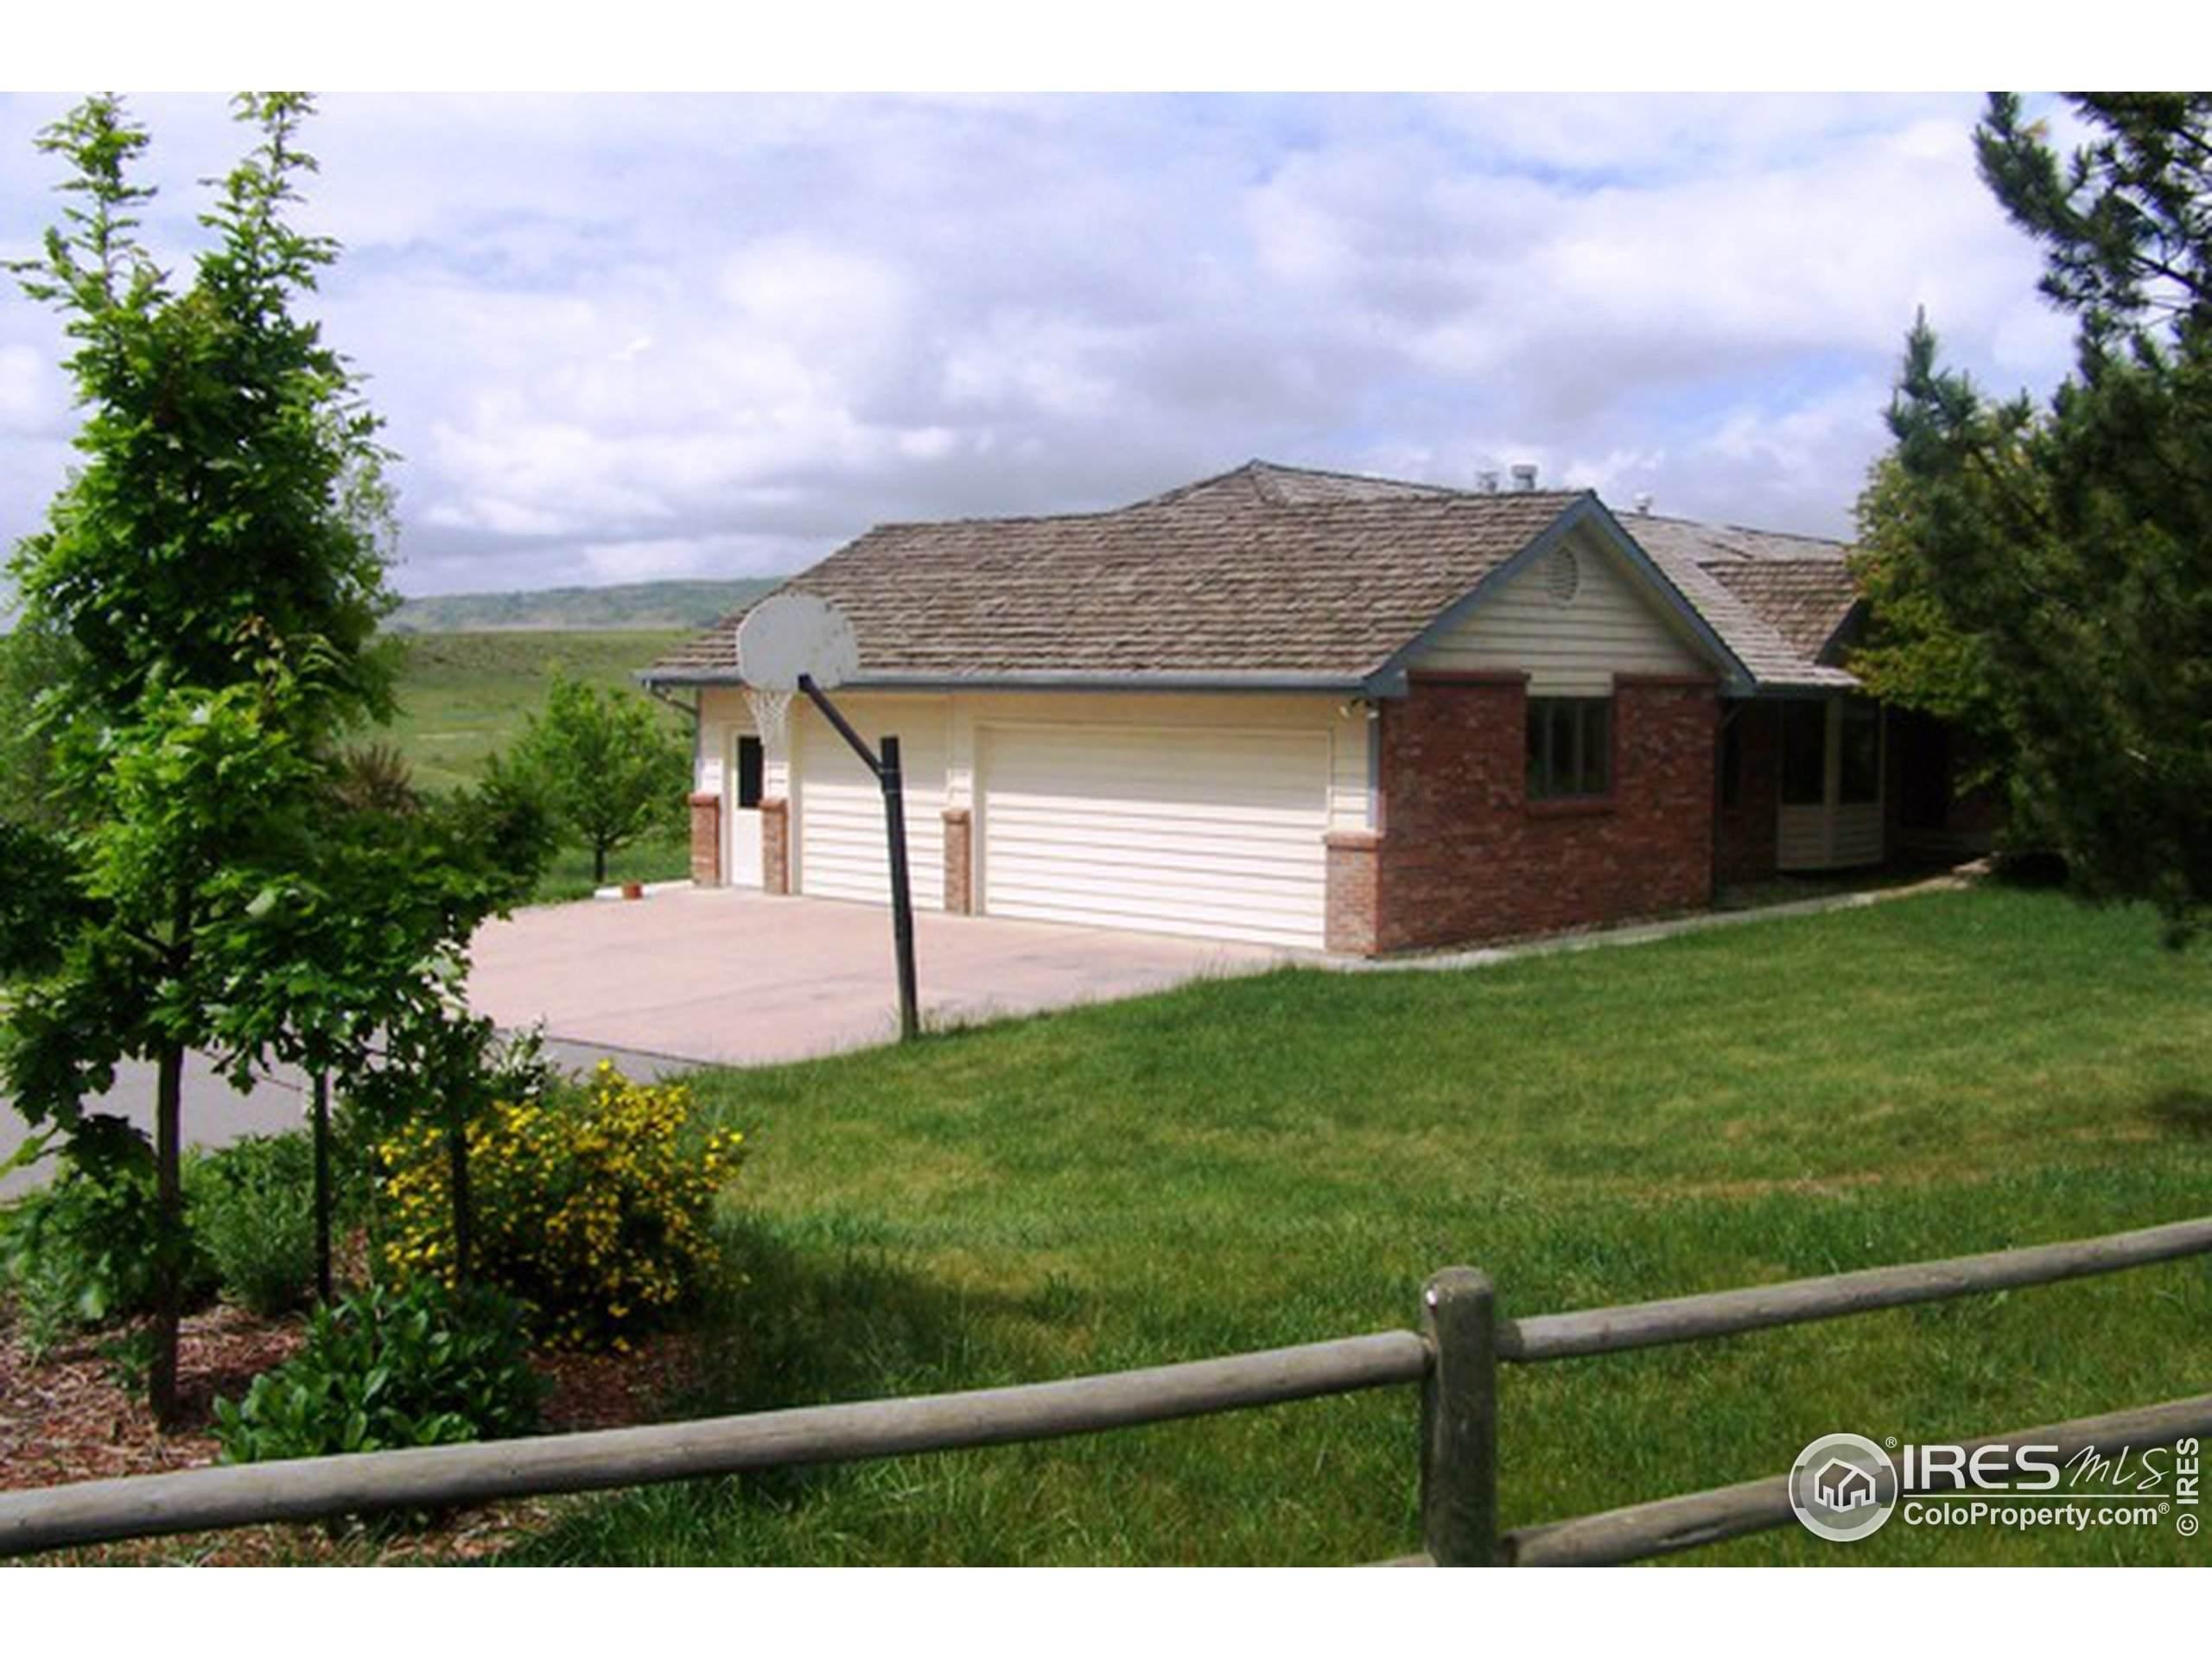 2200 37th St #111, Evans, CO 80620 (MLS #931684) :: Wheelhouse Realty